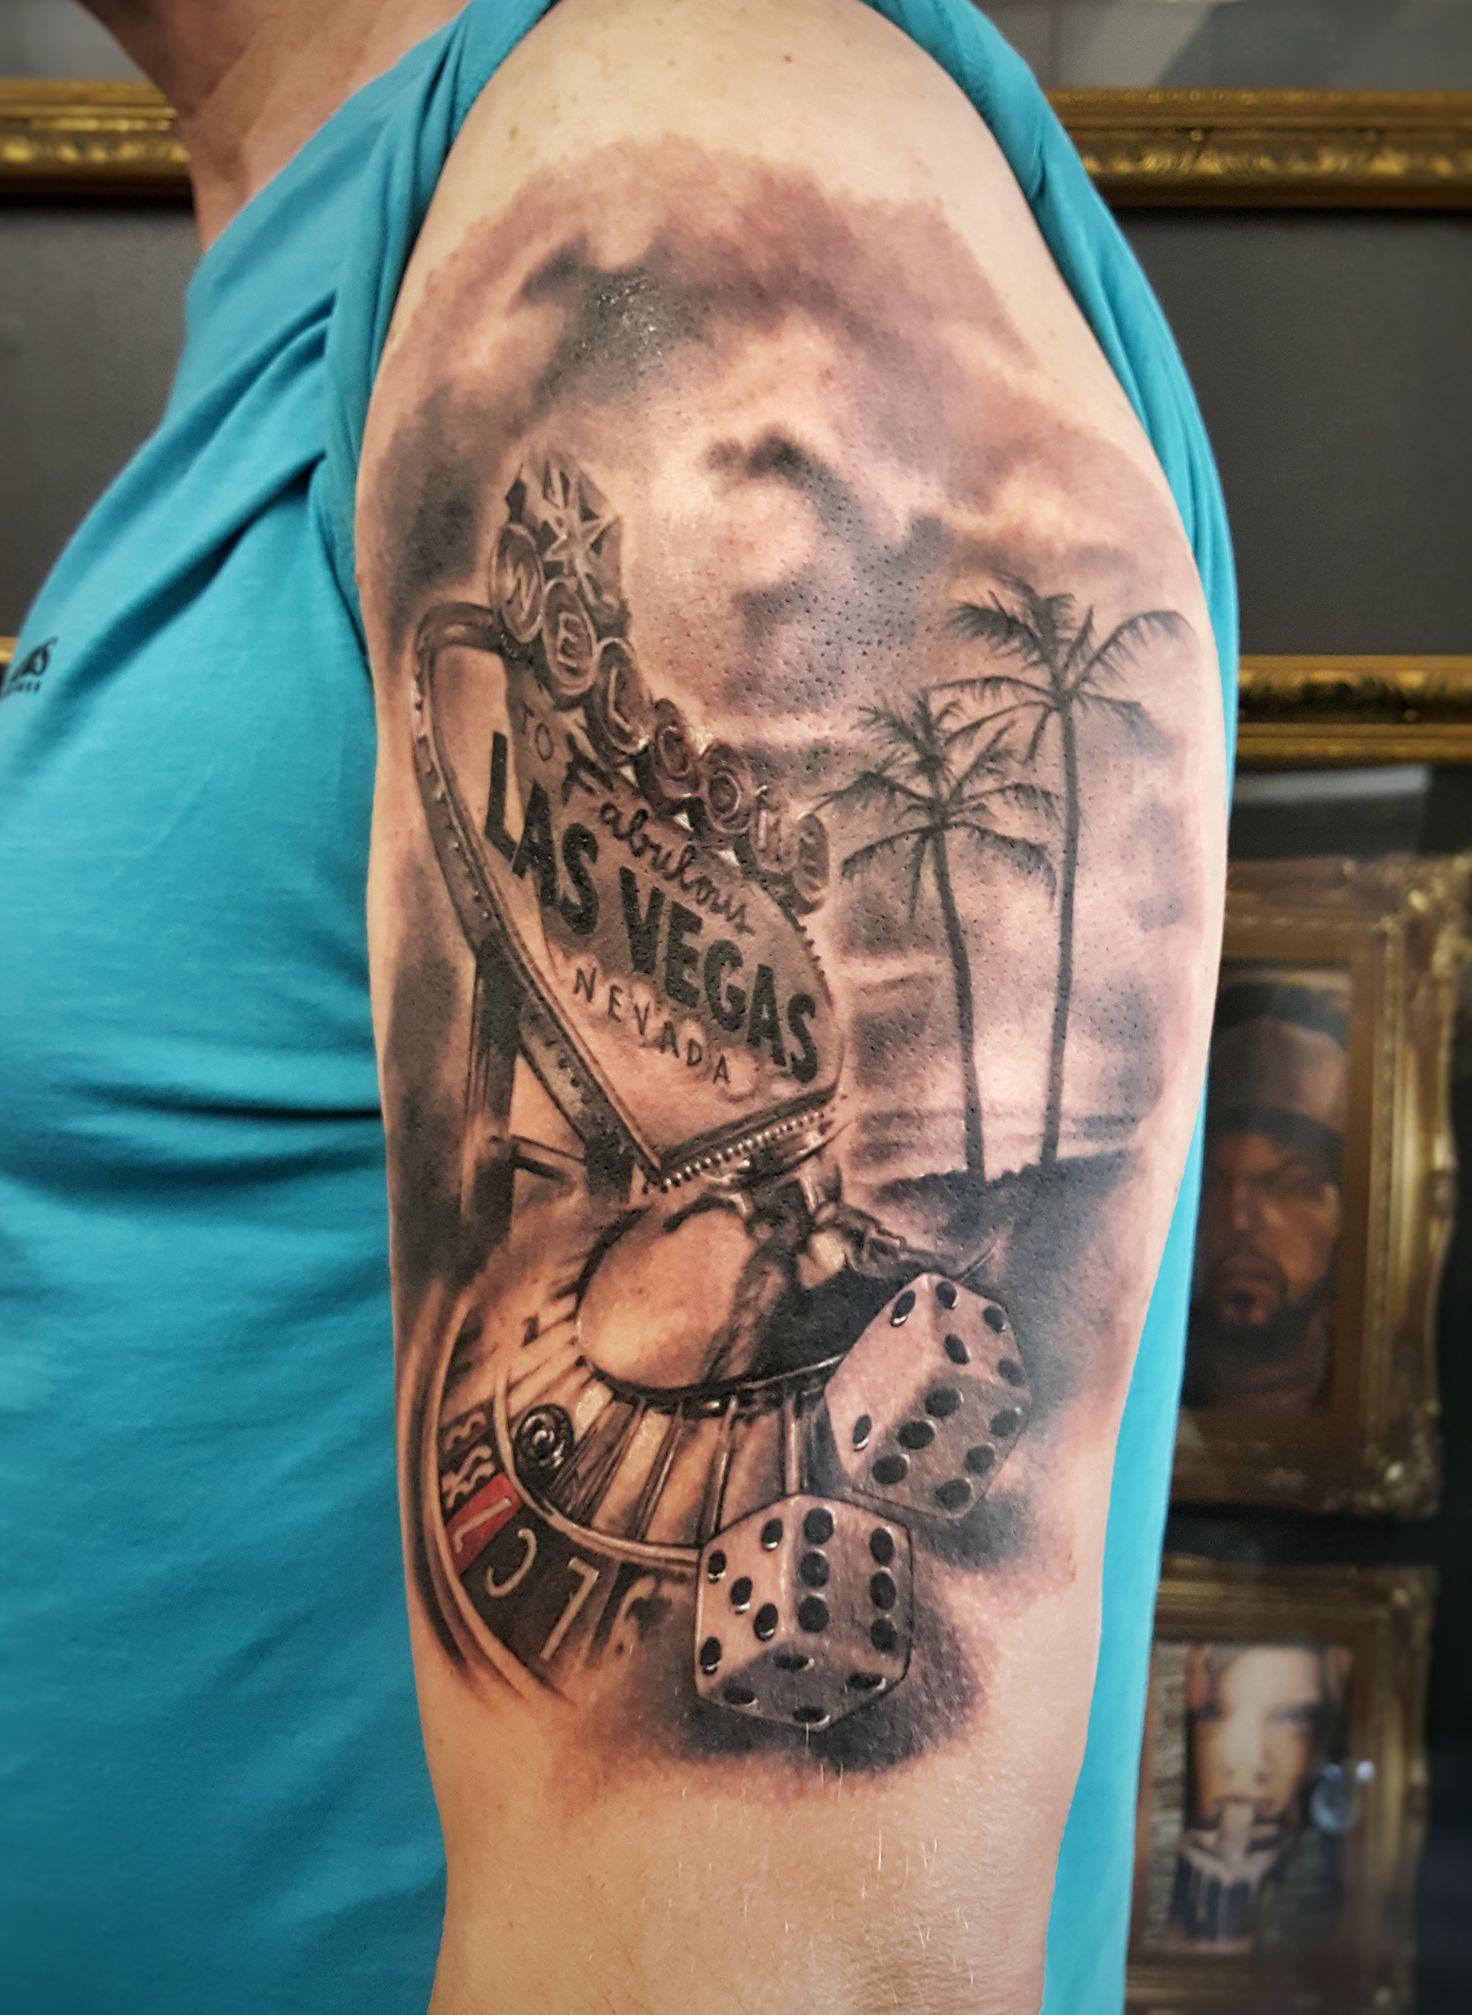 Intim tattoos geile Tattoos